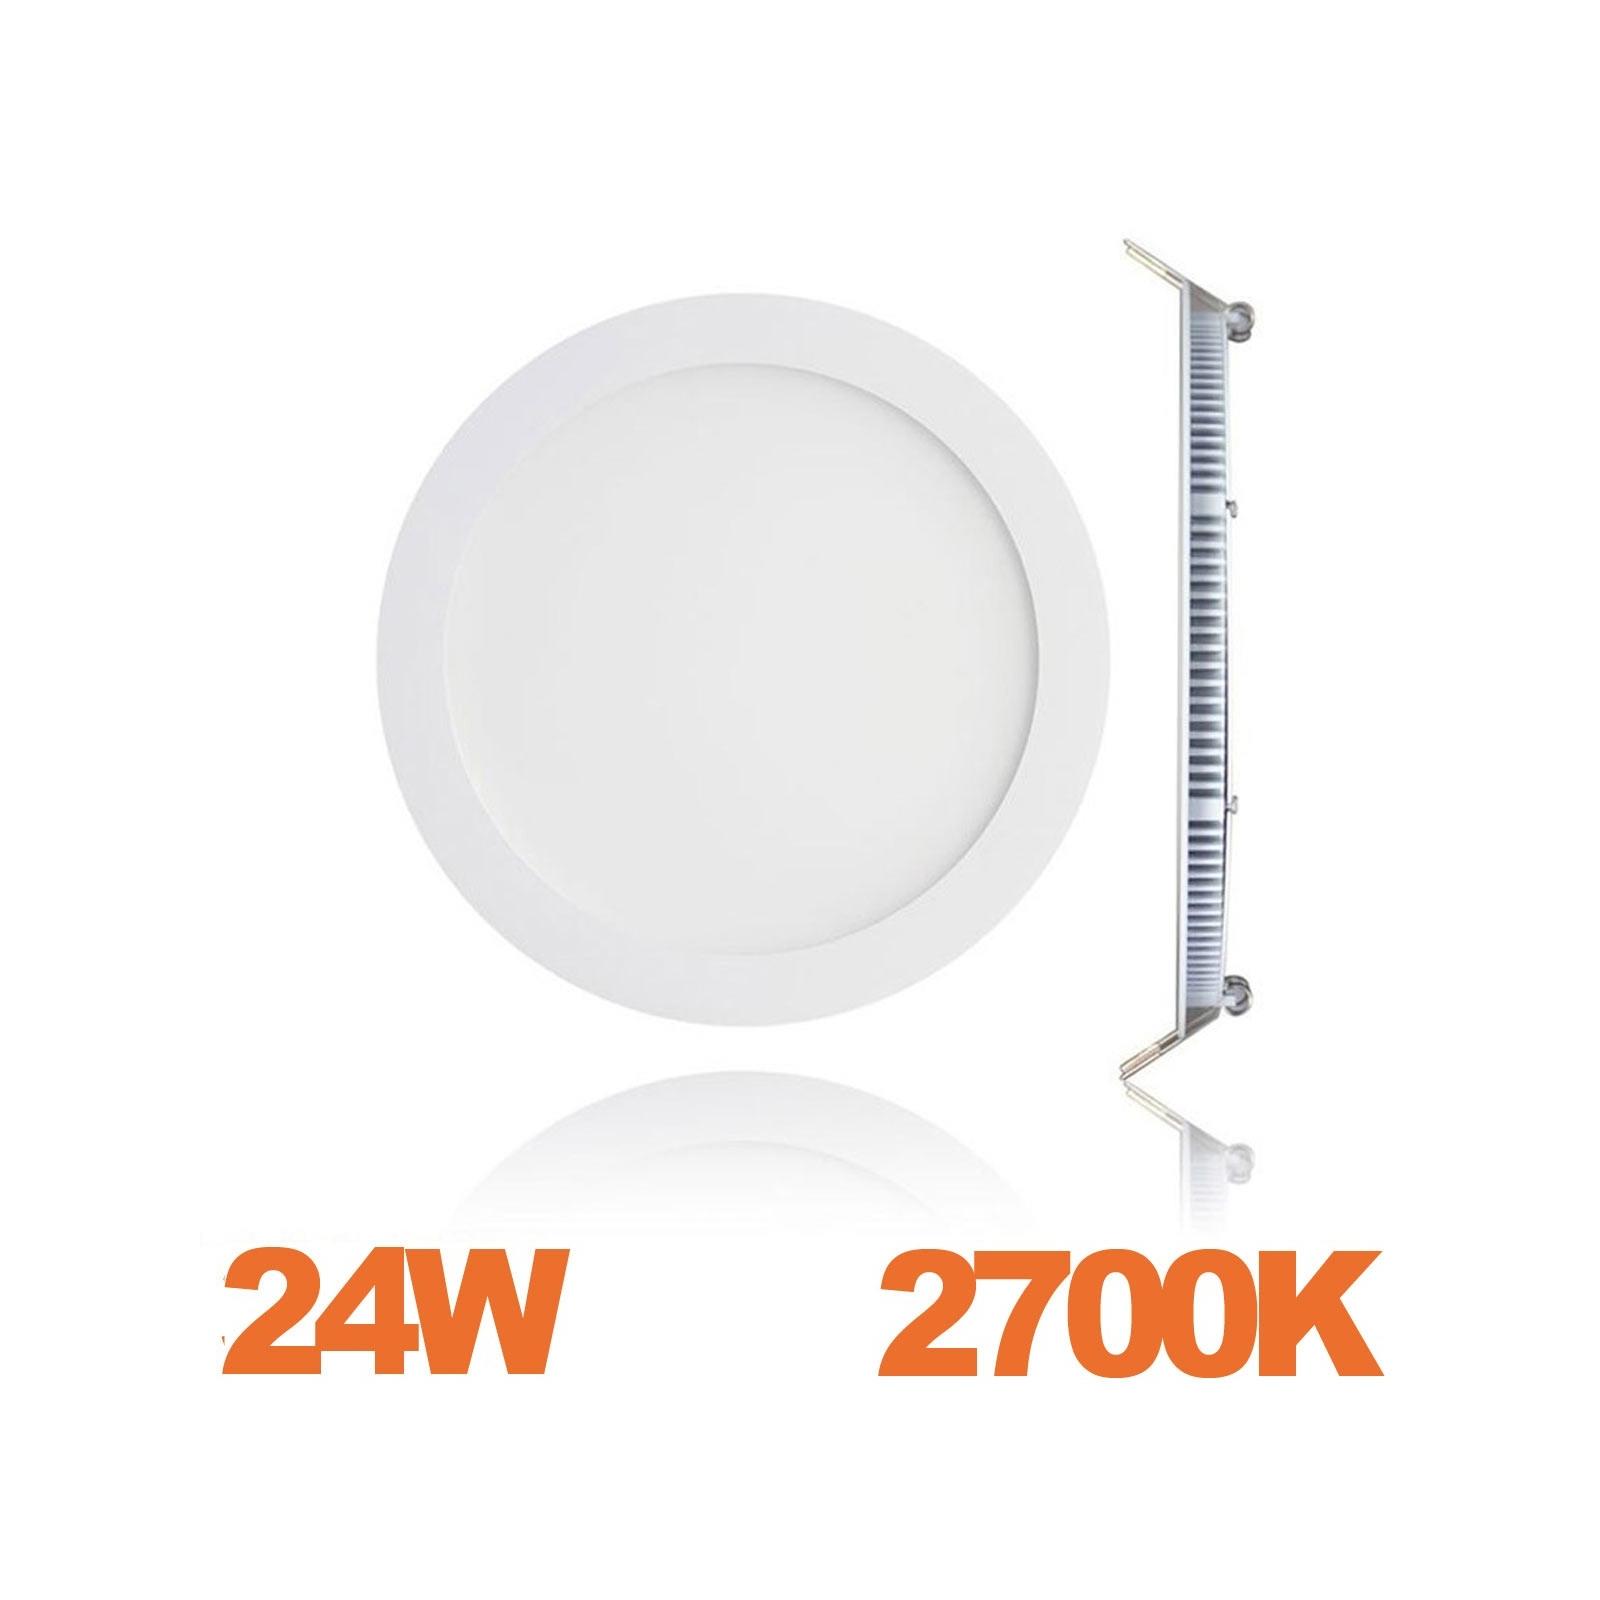 Spot Encastrable LED Downlight Panel Extra-Plat 24W Blanc Chaud 3000K